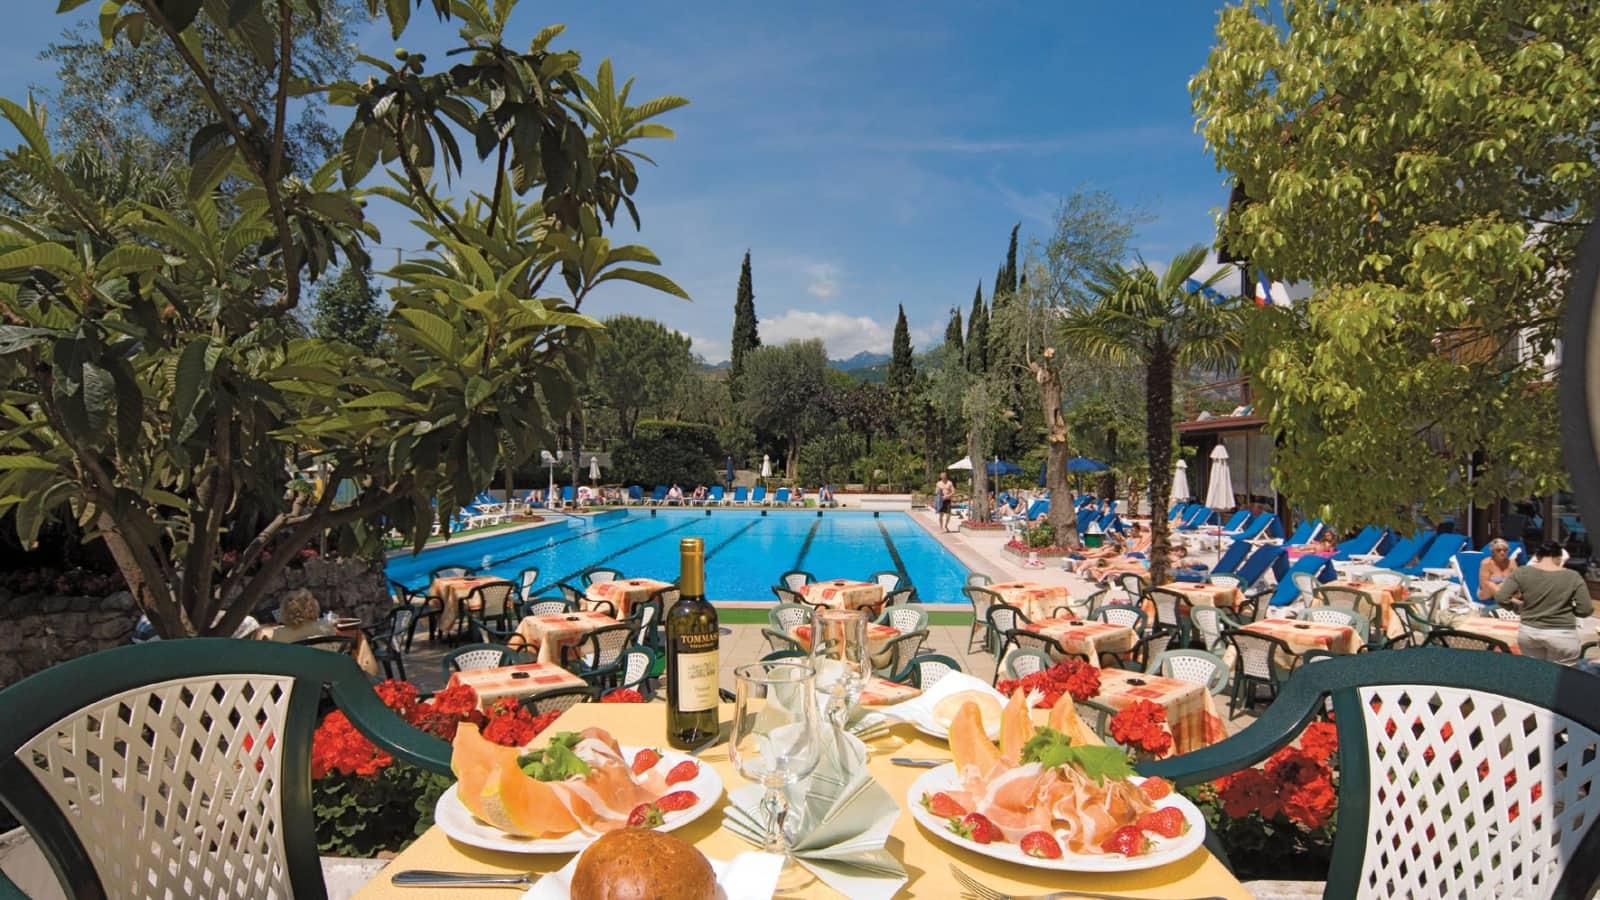 Hotel Majestic Palace Lake Garda Reviews